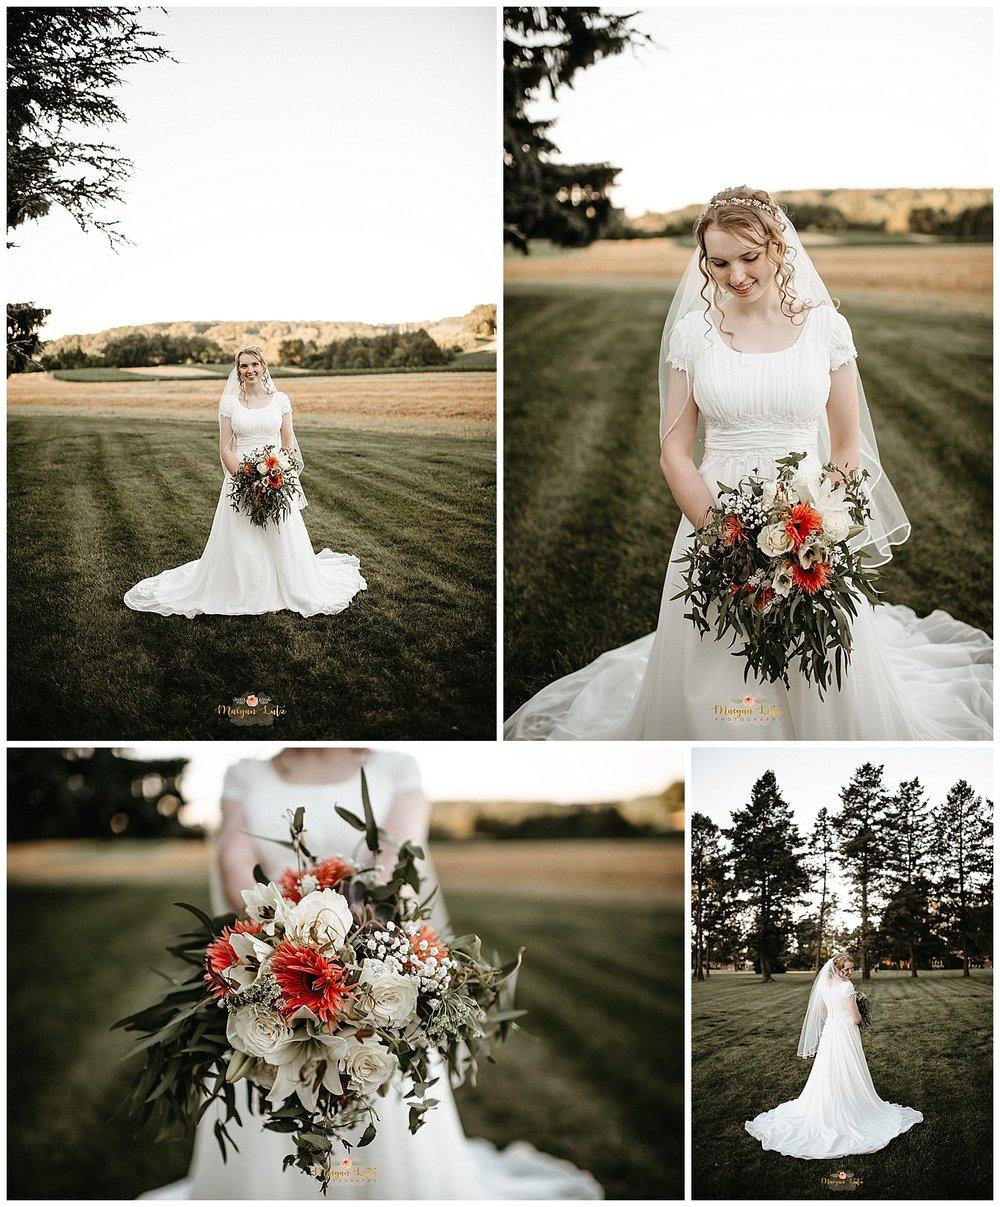 NEPA-Wedding-Photographer-in-Central-PA_0143.jpg